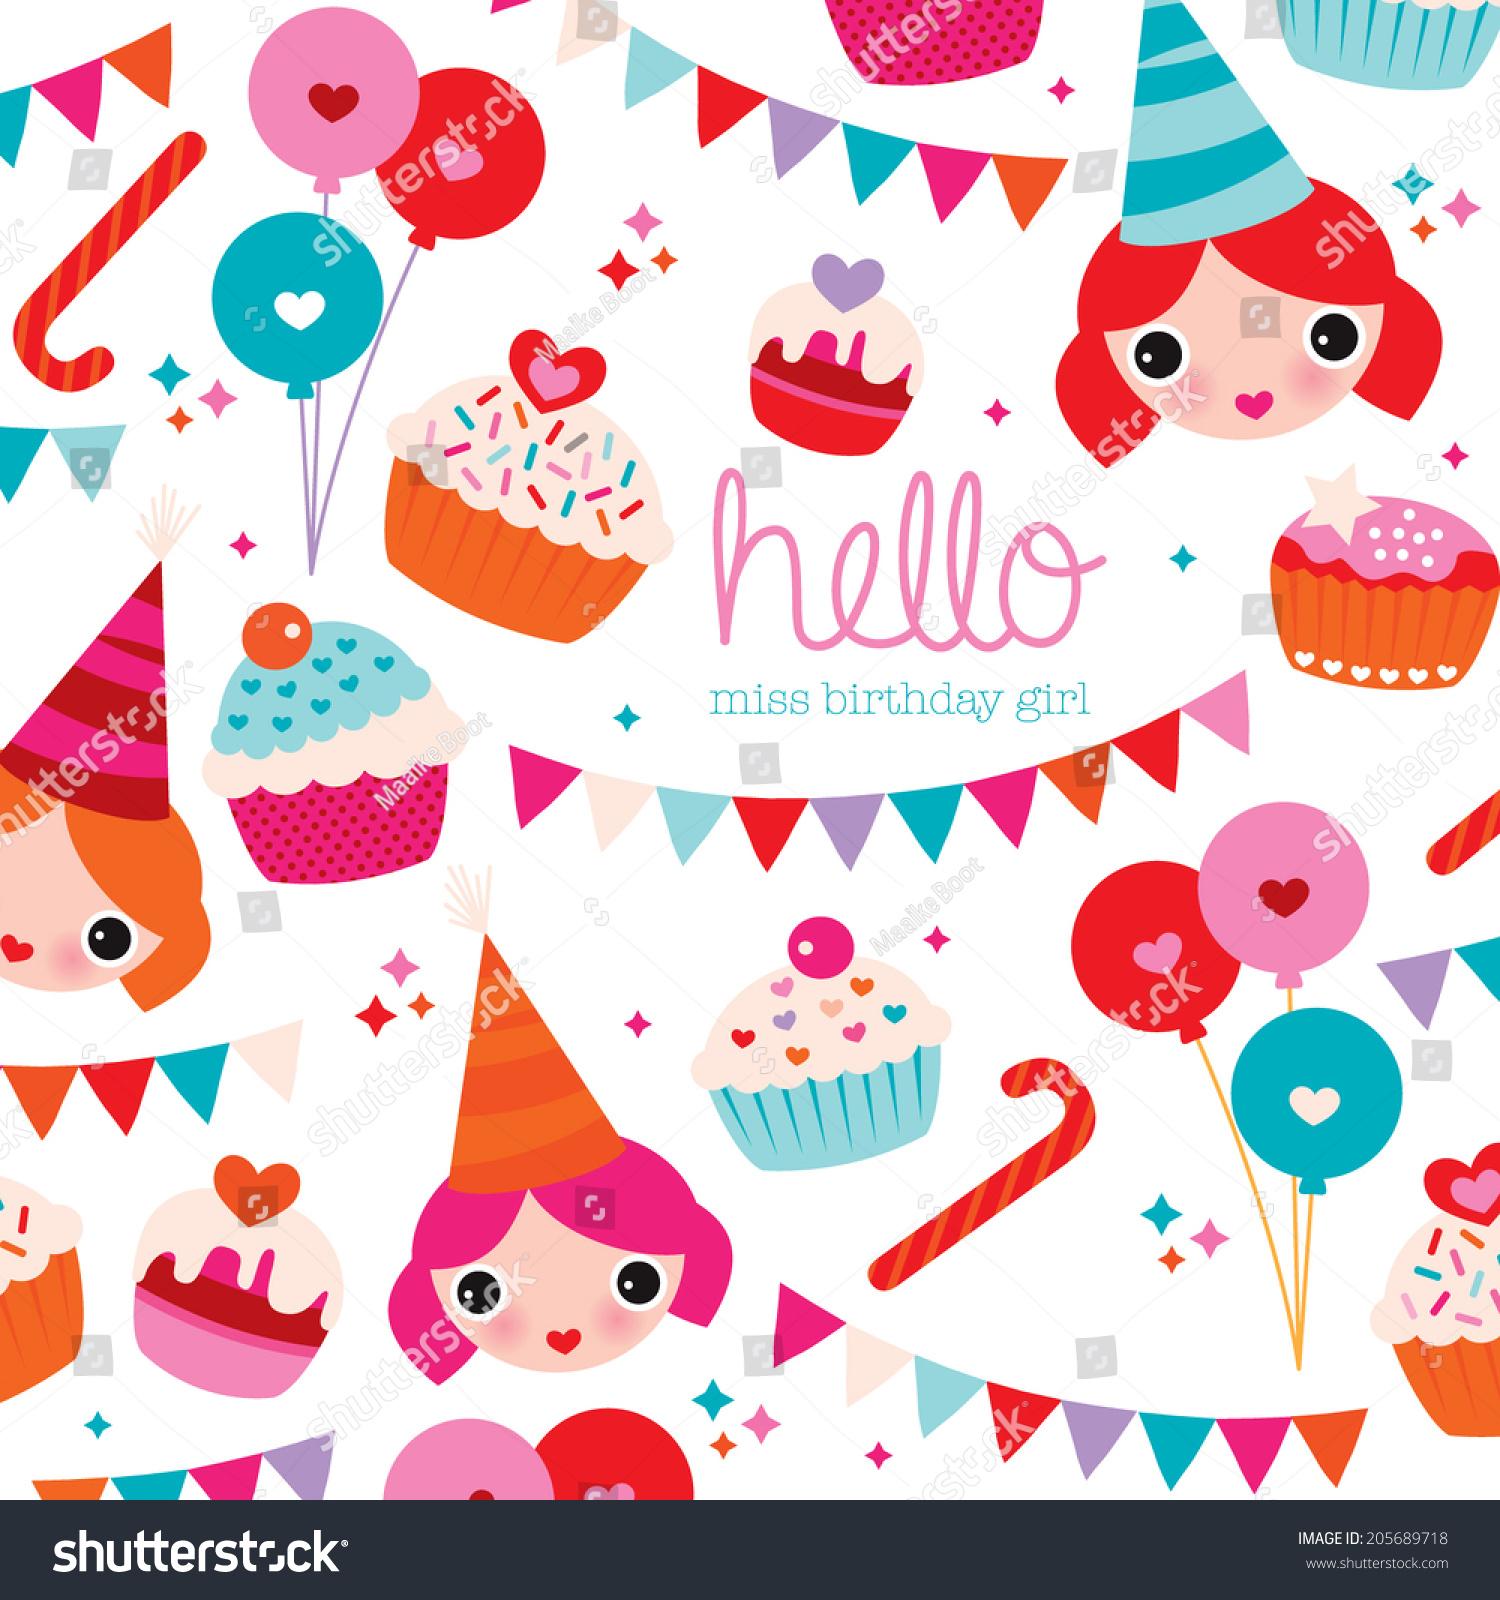 happy birthday little girl birthday party stock vector royalty free